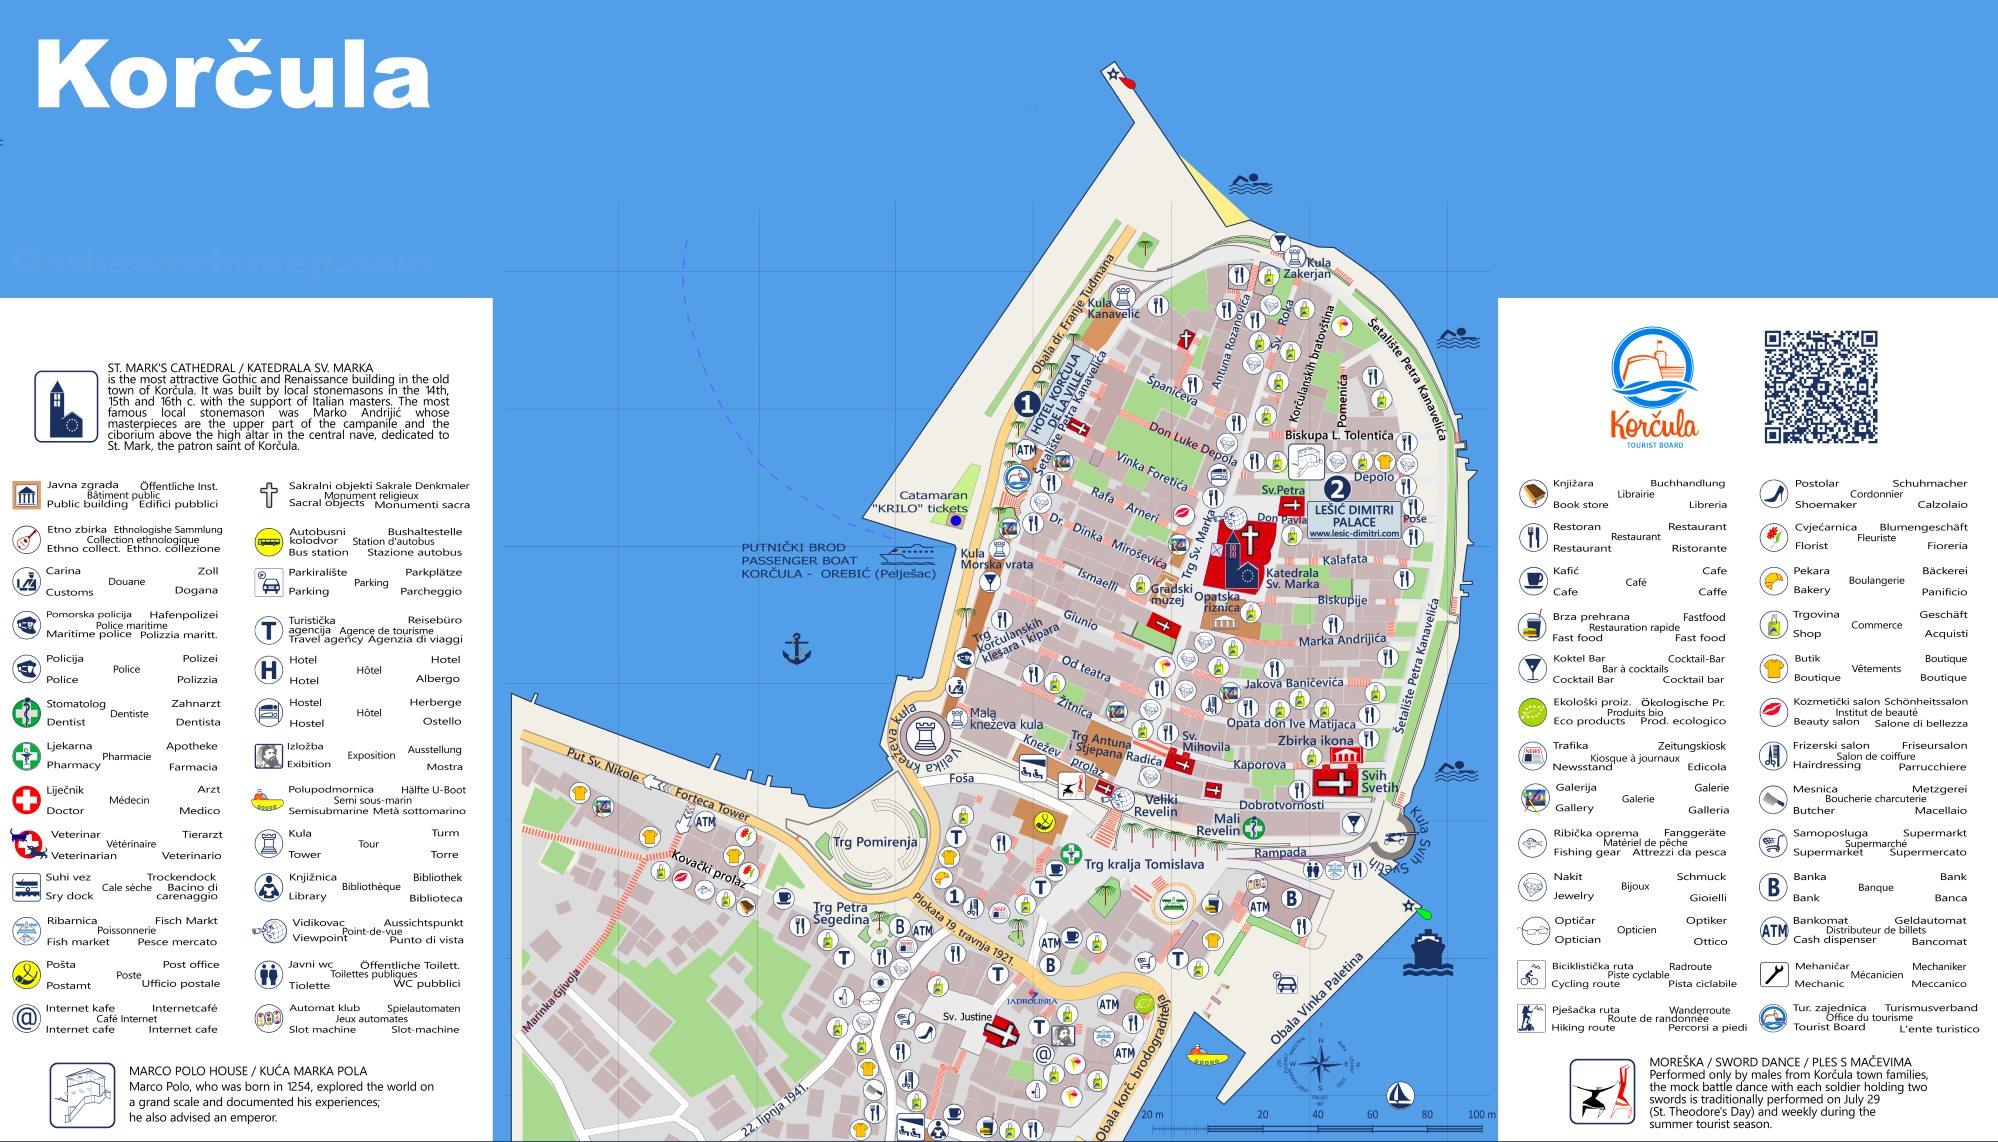 korcula-old-town-map.jpg